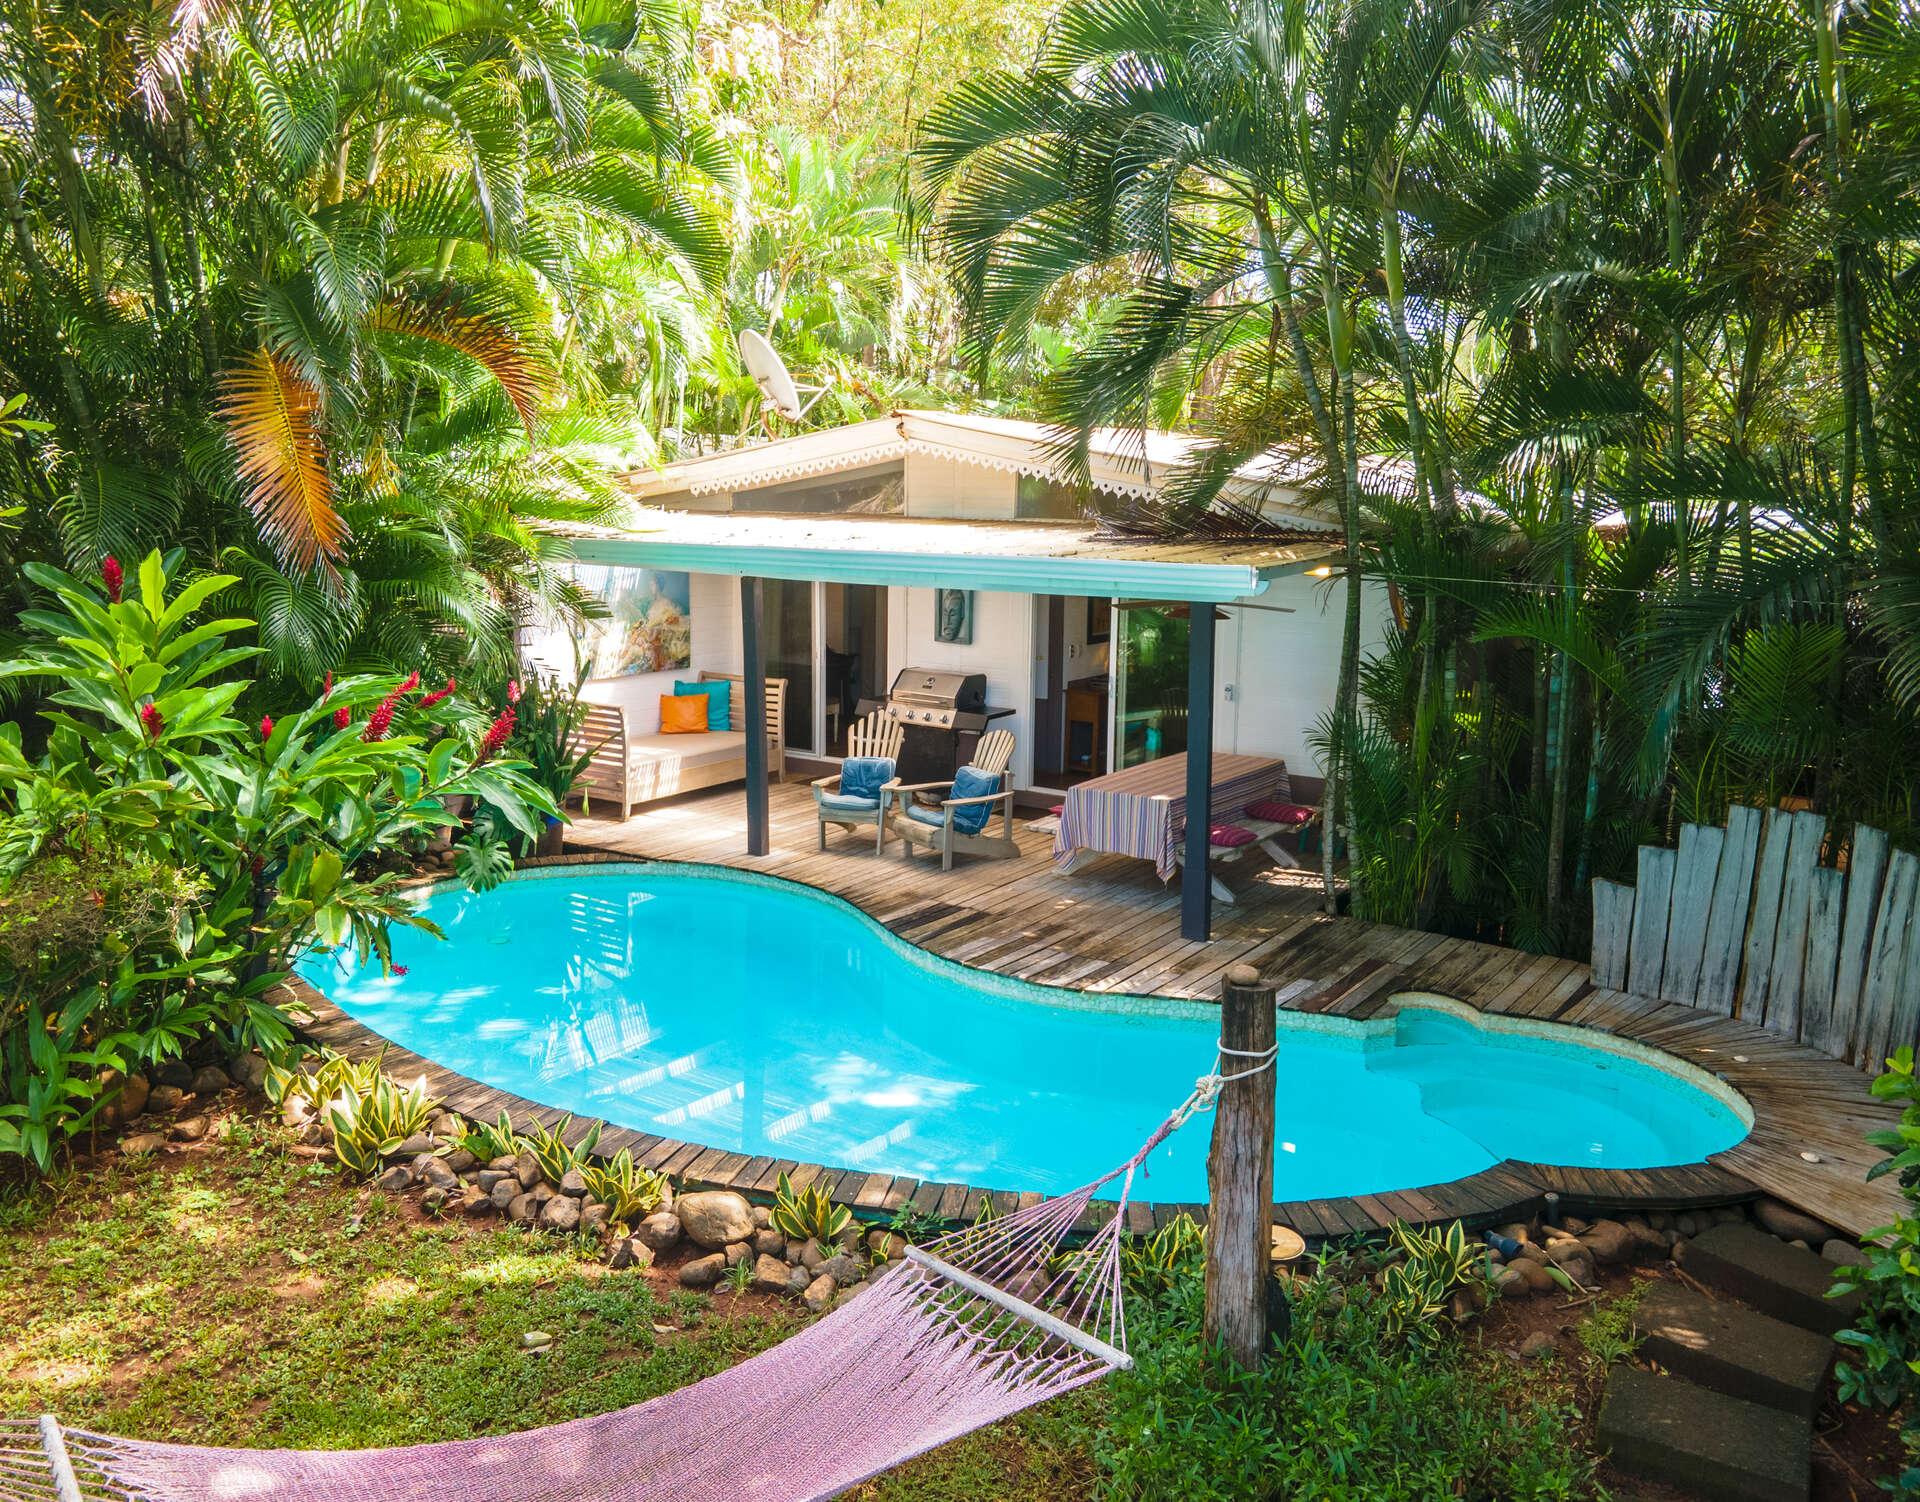 Central america villa rentals - Costa rica - Guanacaste - Playa junquillal - Villa Oceanis - Image 1/14